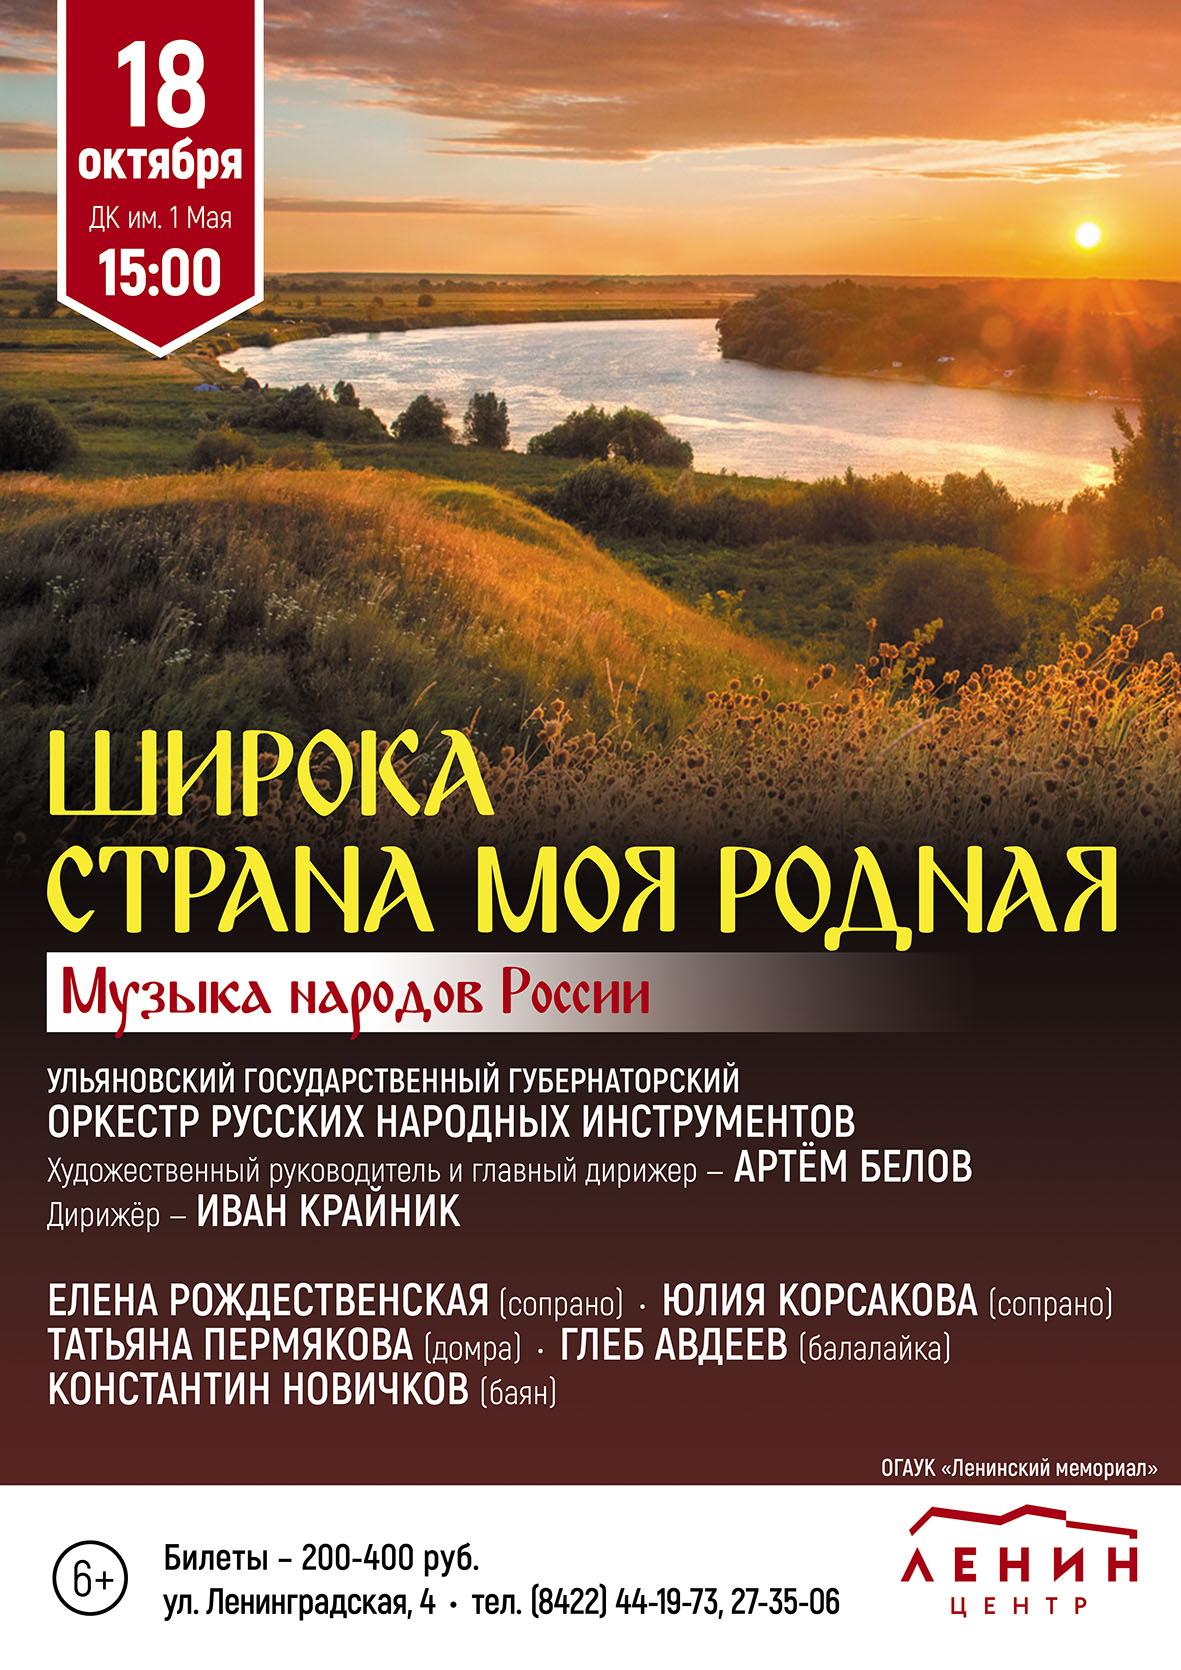 Концерт «Широка страна моя родная» @ ДК имени 1 мая  (ул. Академика Сахарова, д. 9/4)